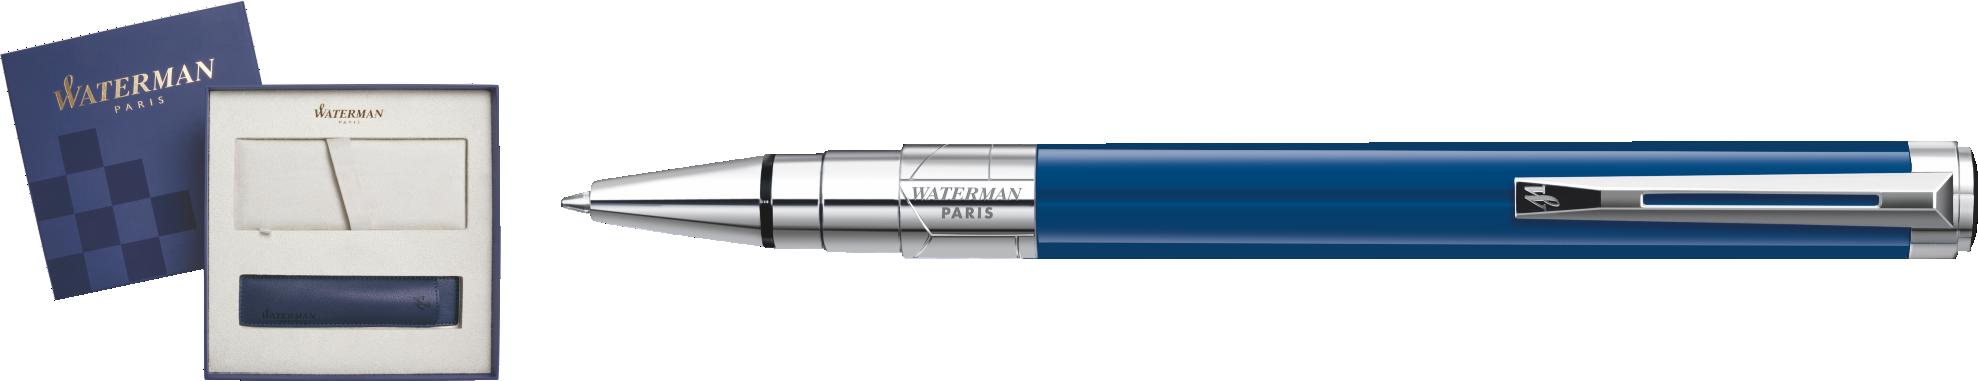 1904579Cover Waterman Perspective Подарочный набор Шариковая ручка, Blue Obsession CT с чехлом